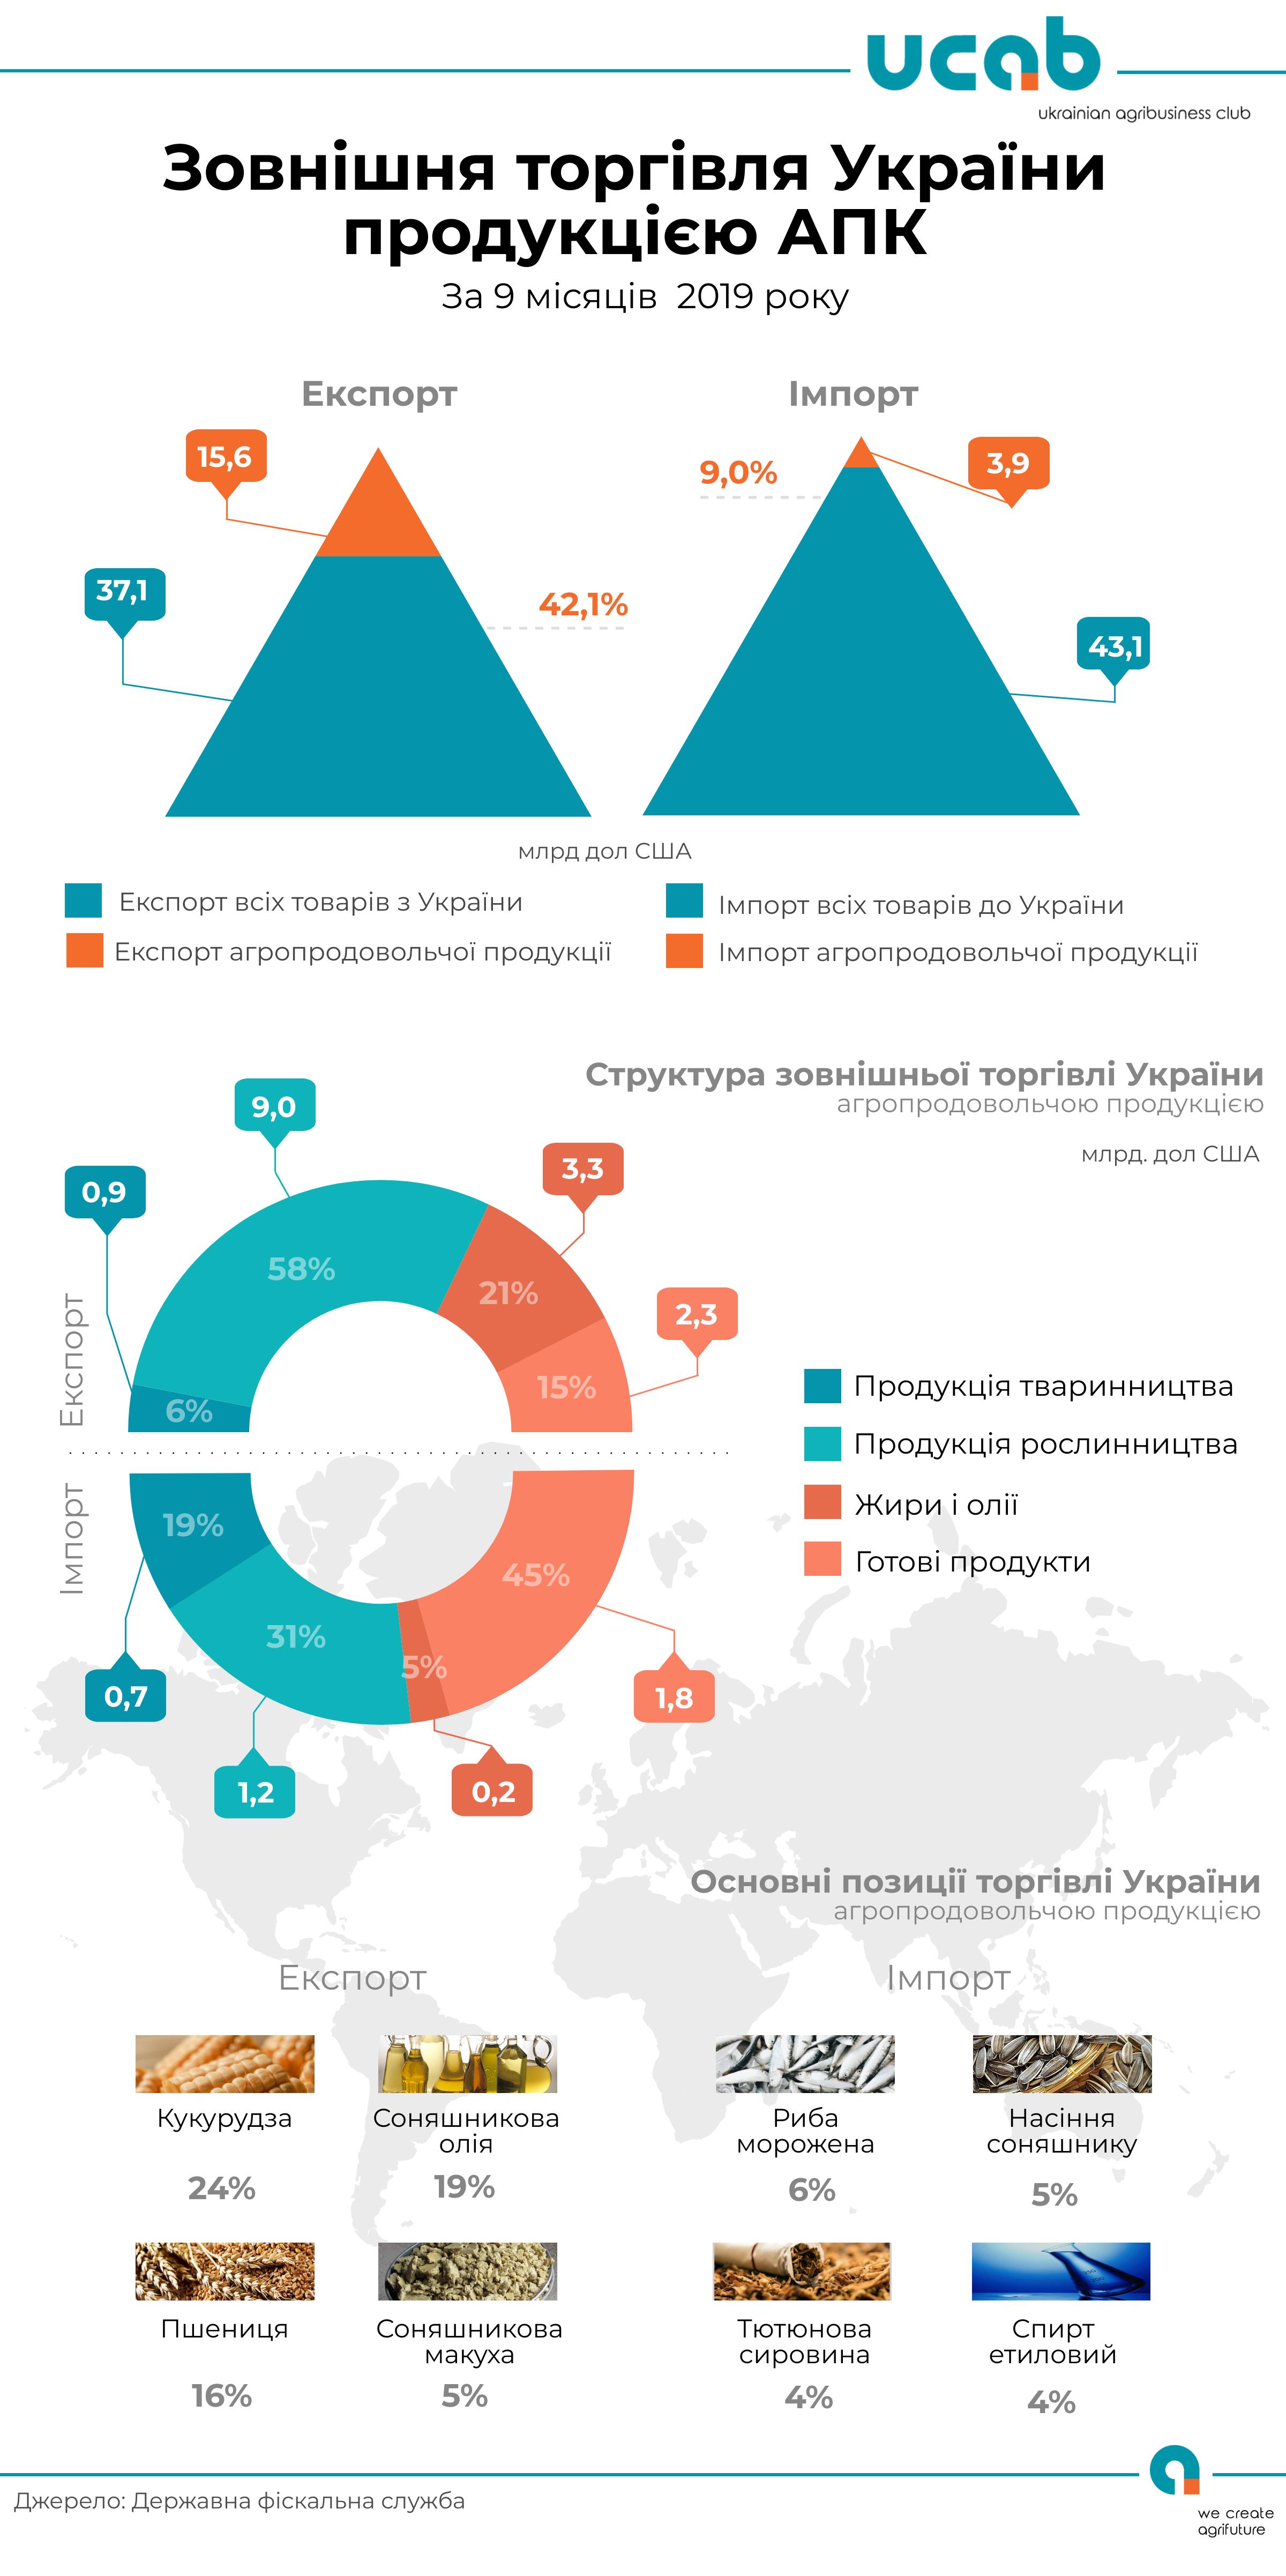 Украина увеличила экспорт агропродукции на 22%